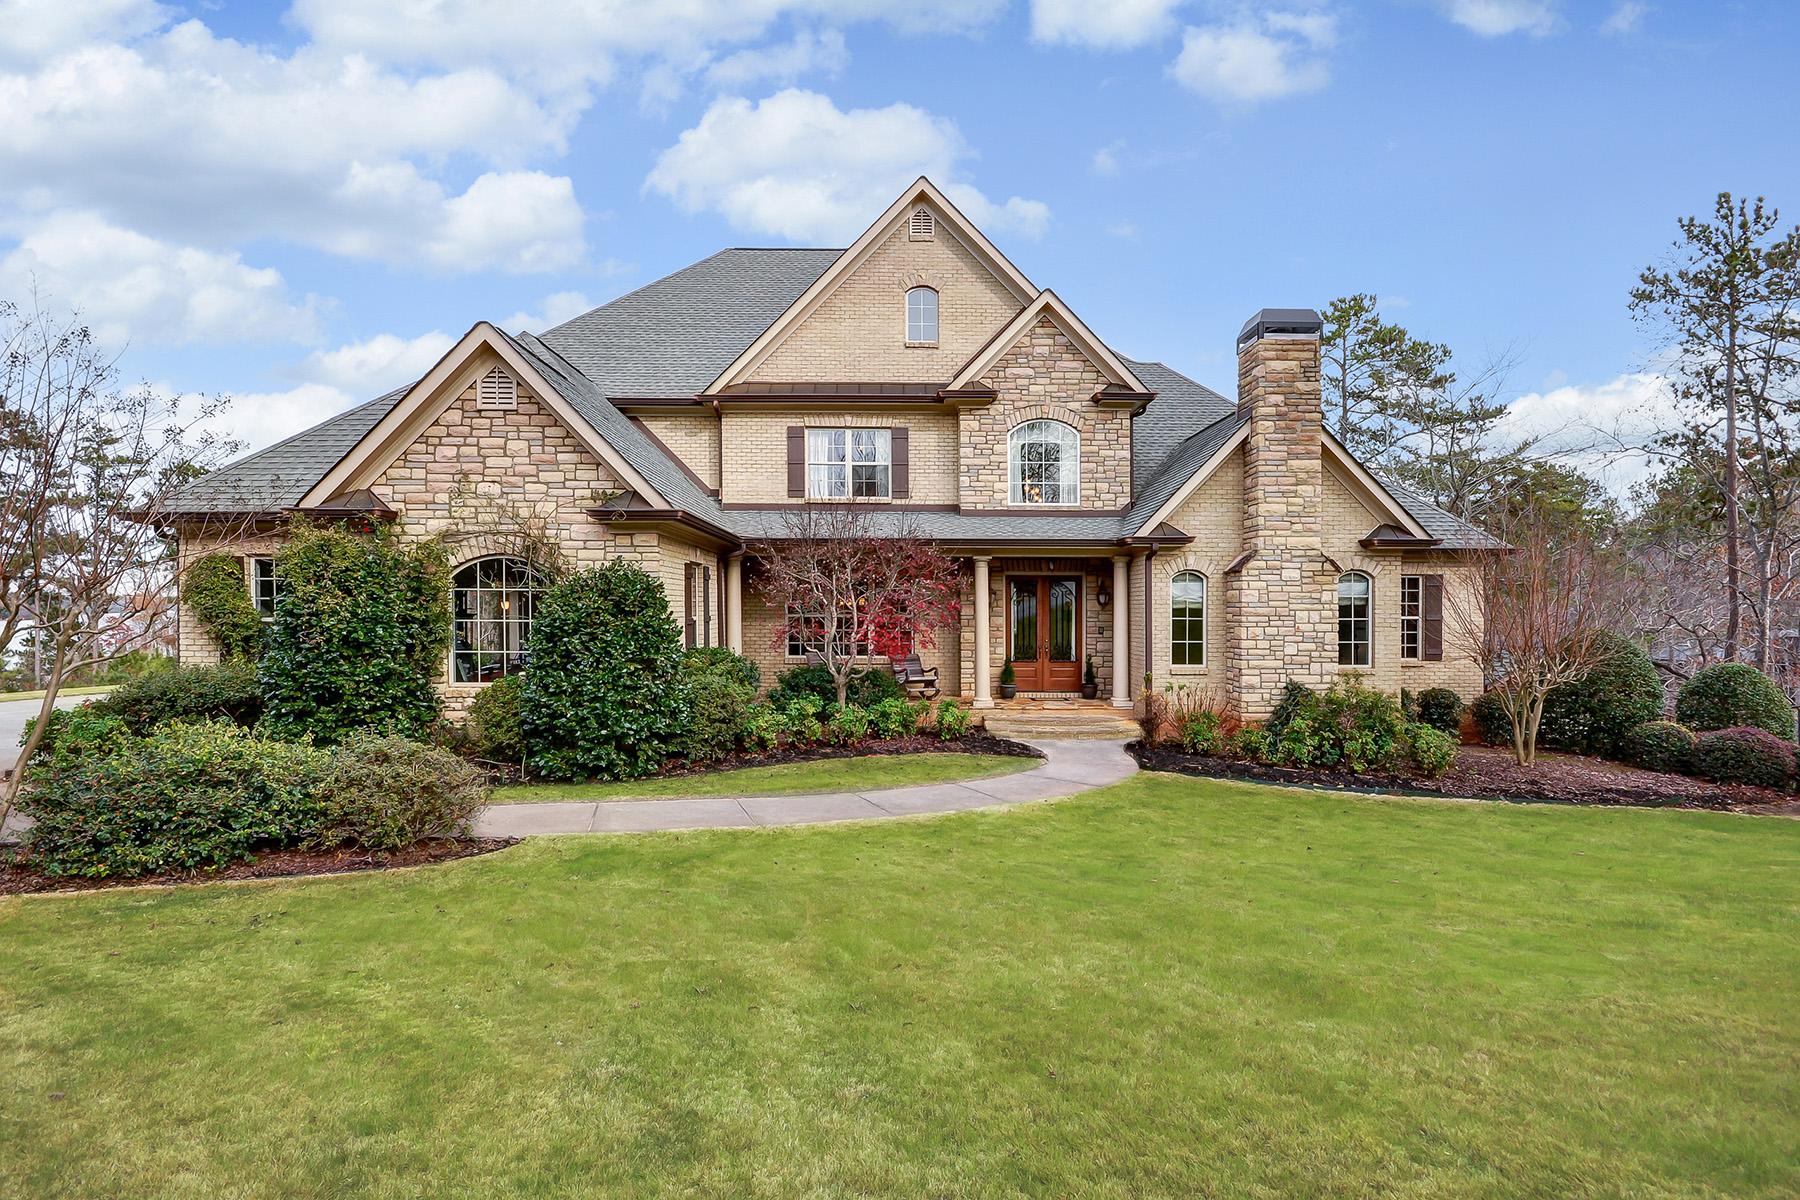 Single Family Home for Sale at Lake Lanier Estate 5492 Key Point Gainesville, Georgia 30504 United States